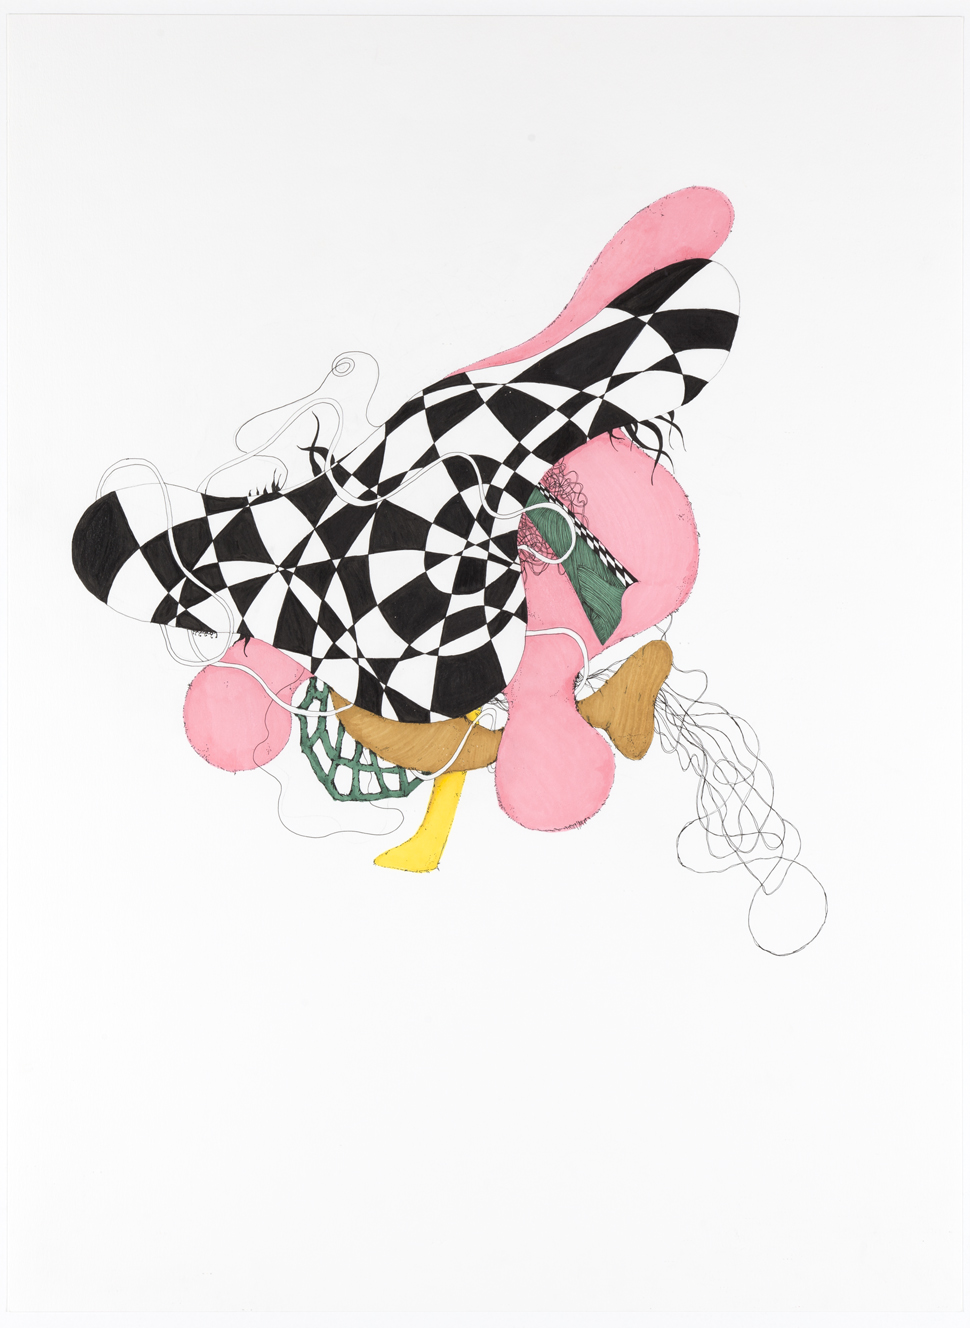 Michelle D'Cruz - Untitled